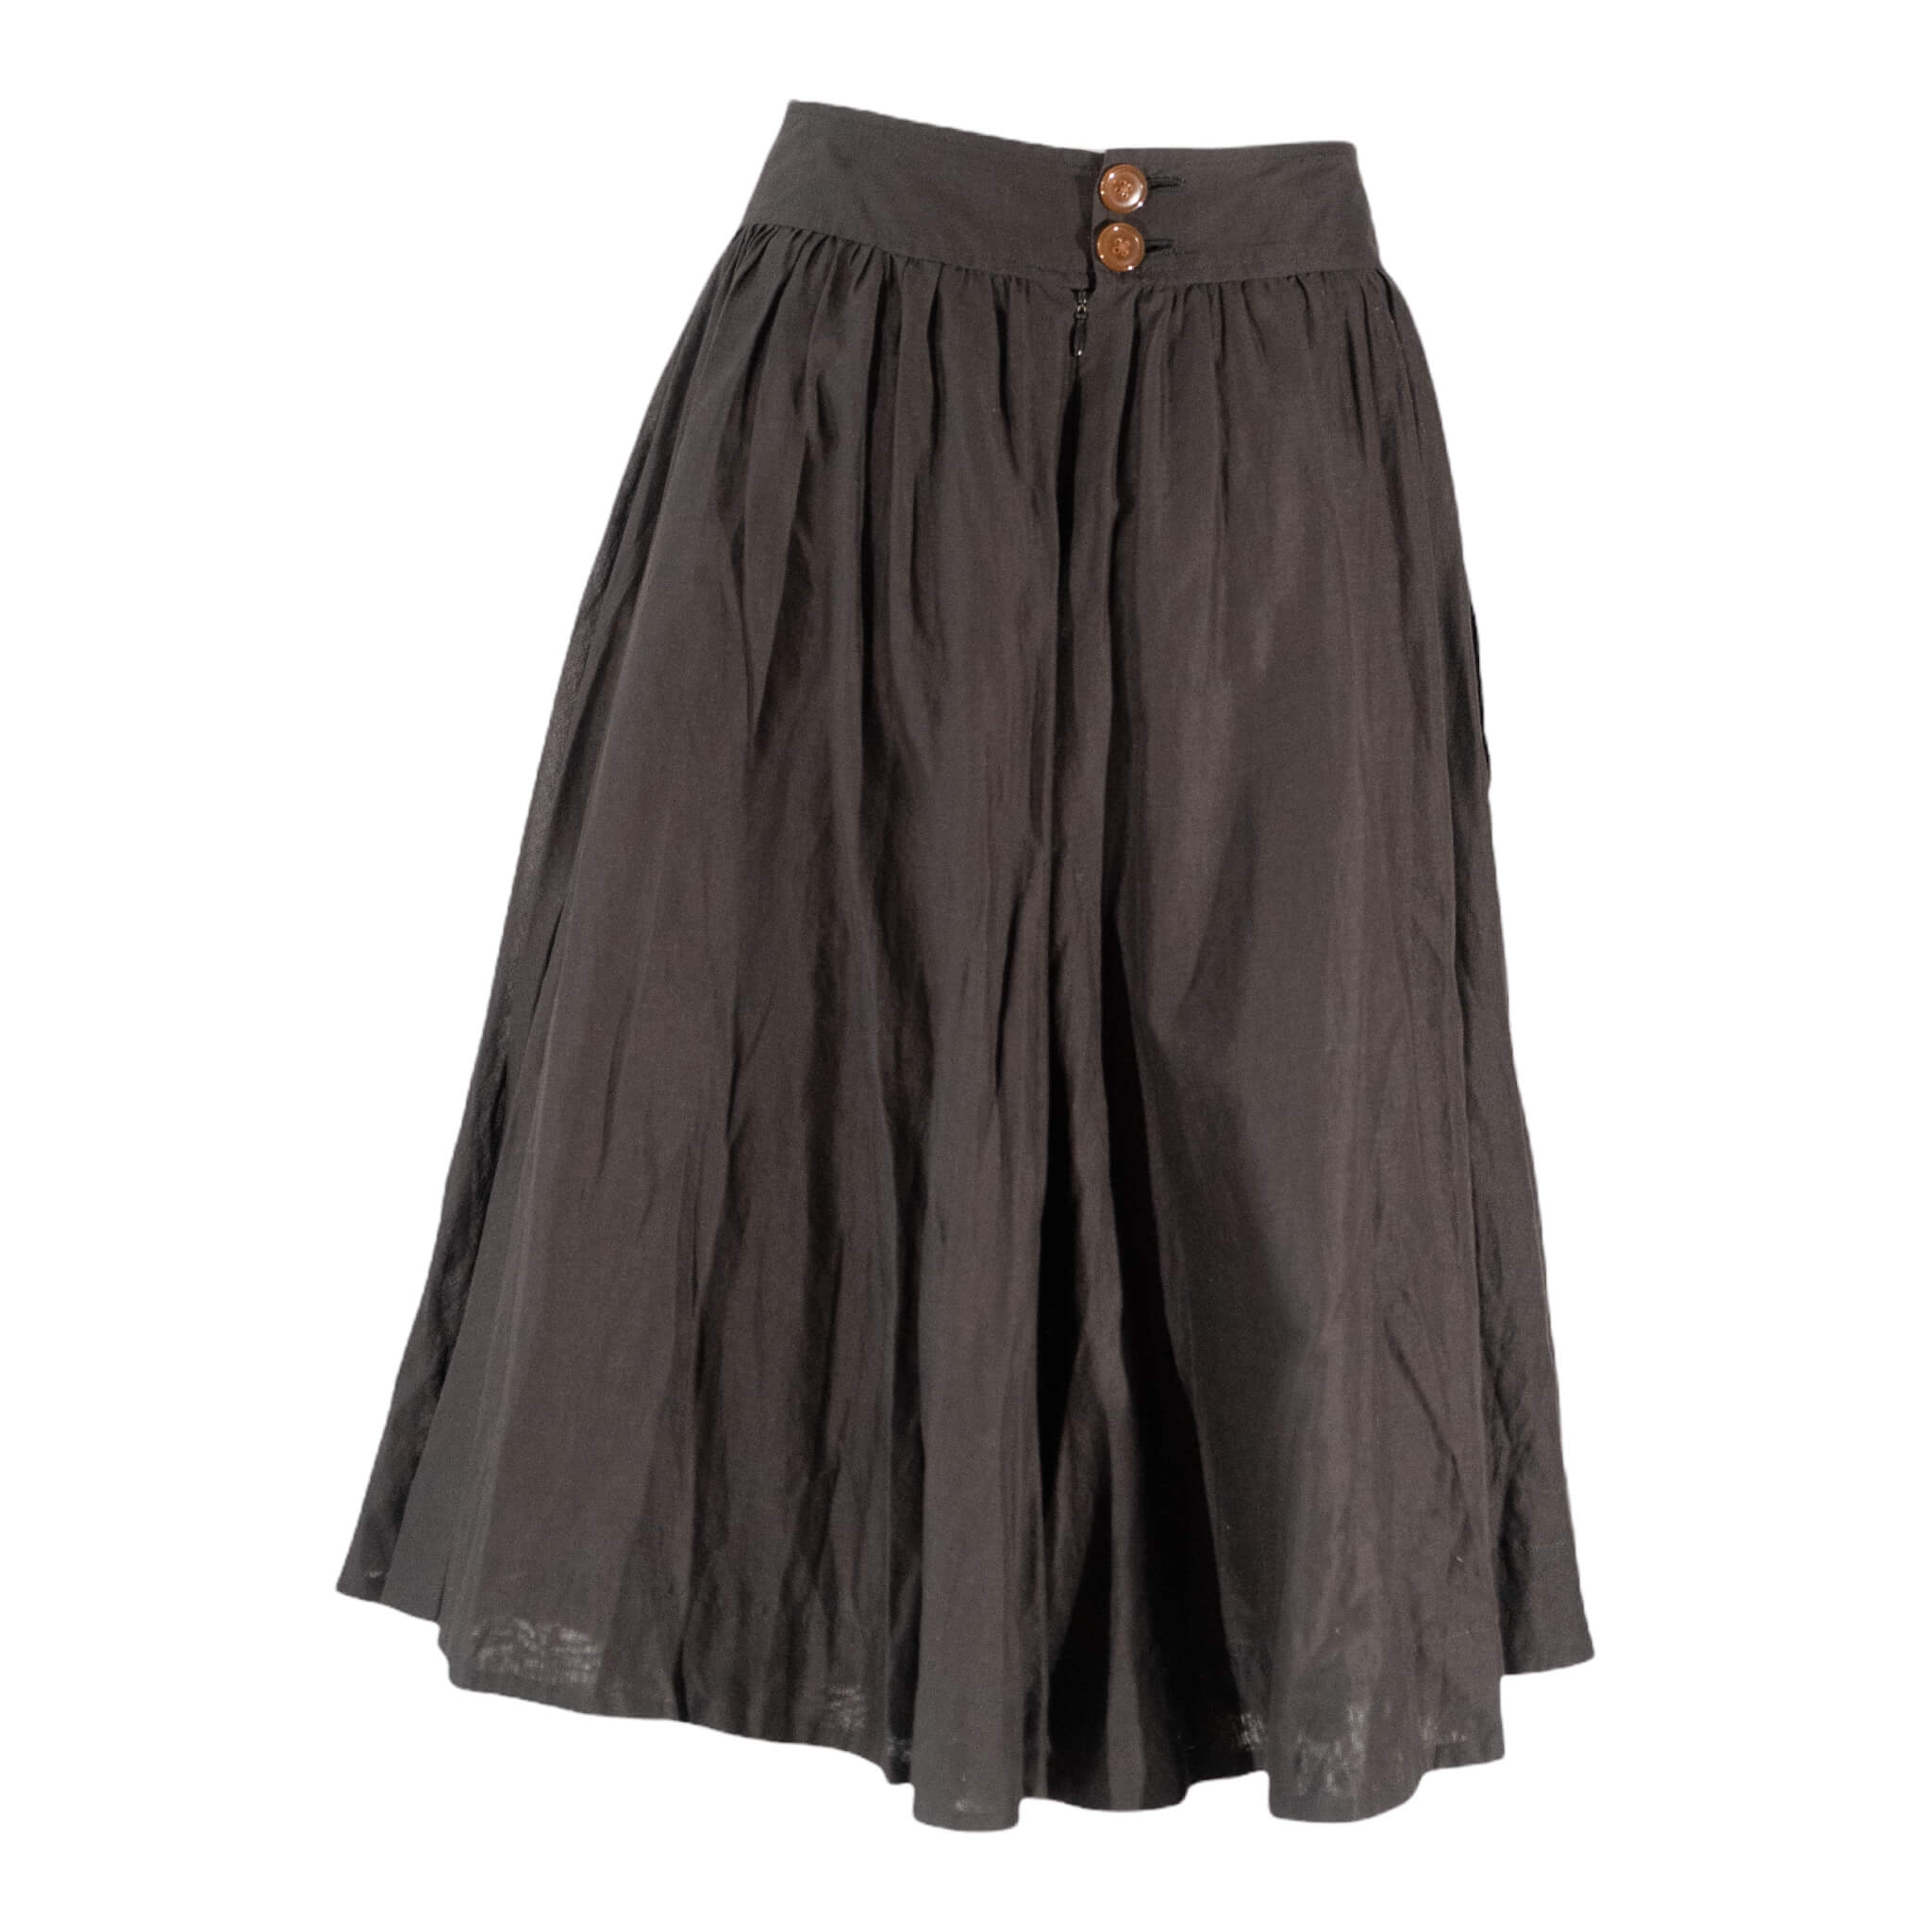 Vivienne Westwood Linen Flow Skirt